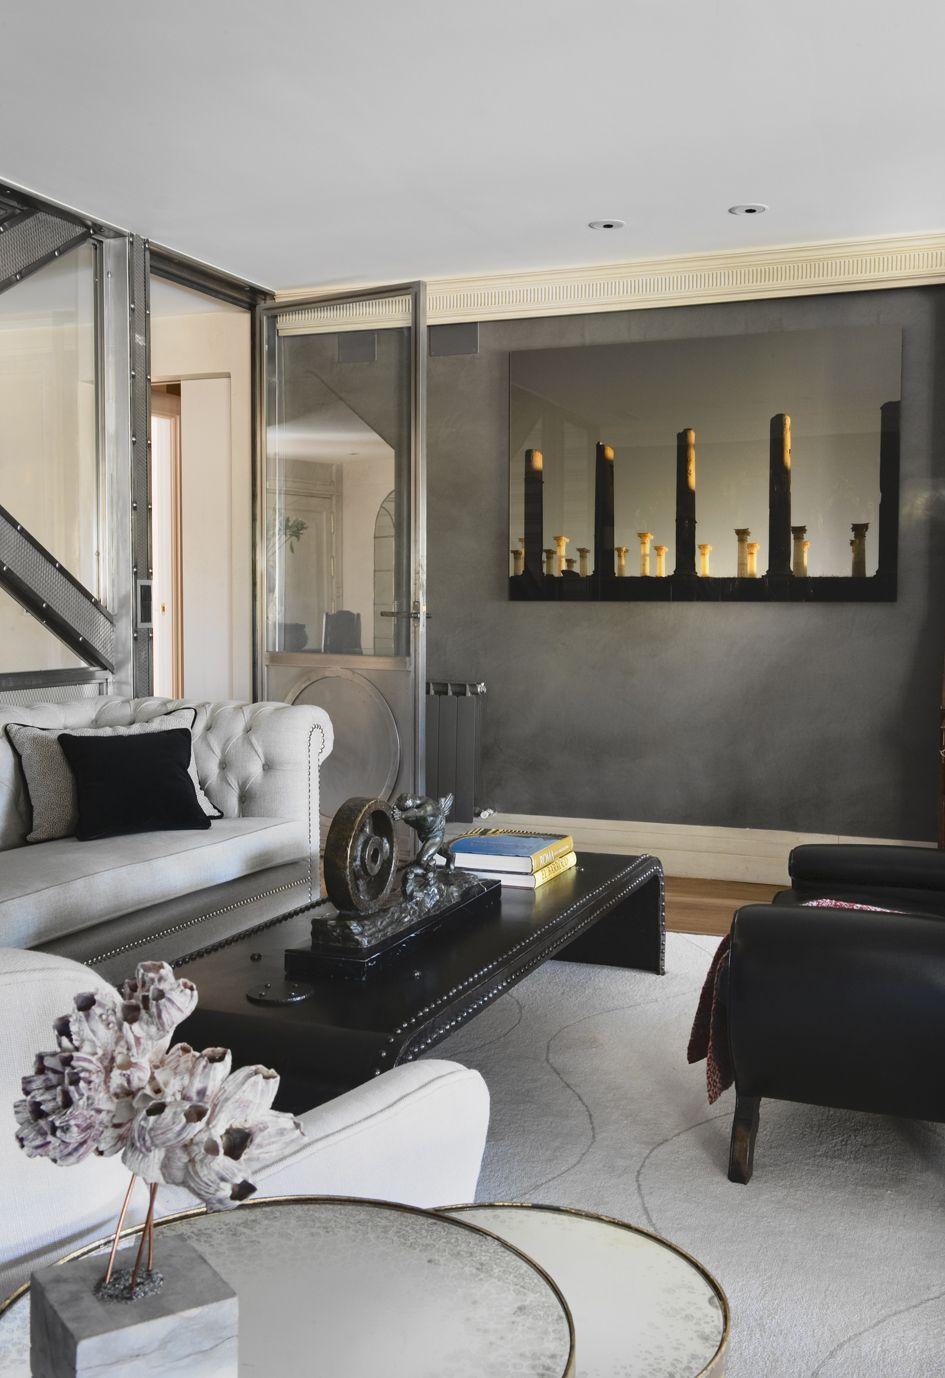 Proyecto 6 luisa olaz bal estudio de interiorismo - Interiorismo salones ...